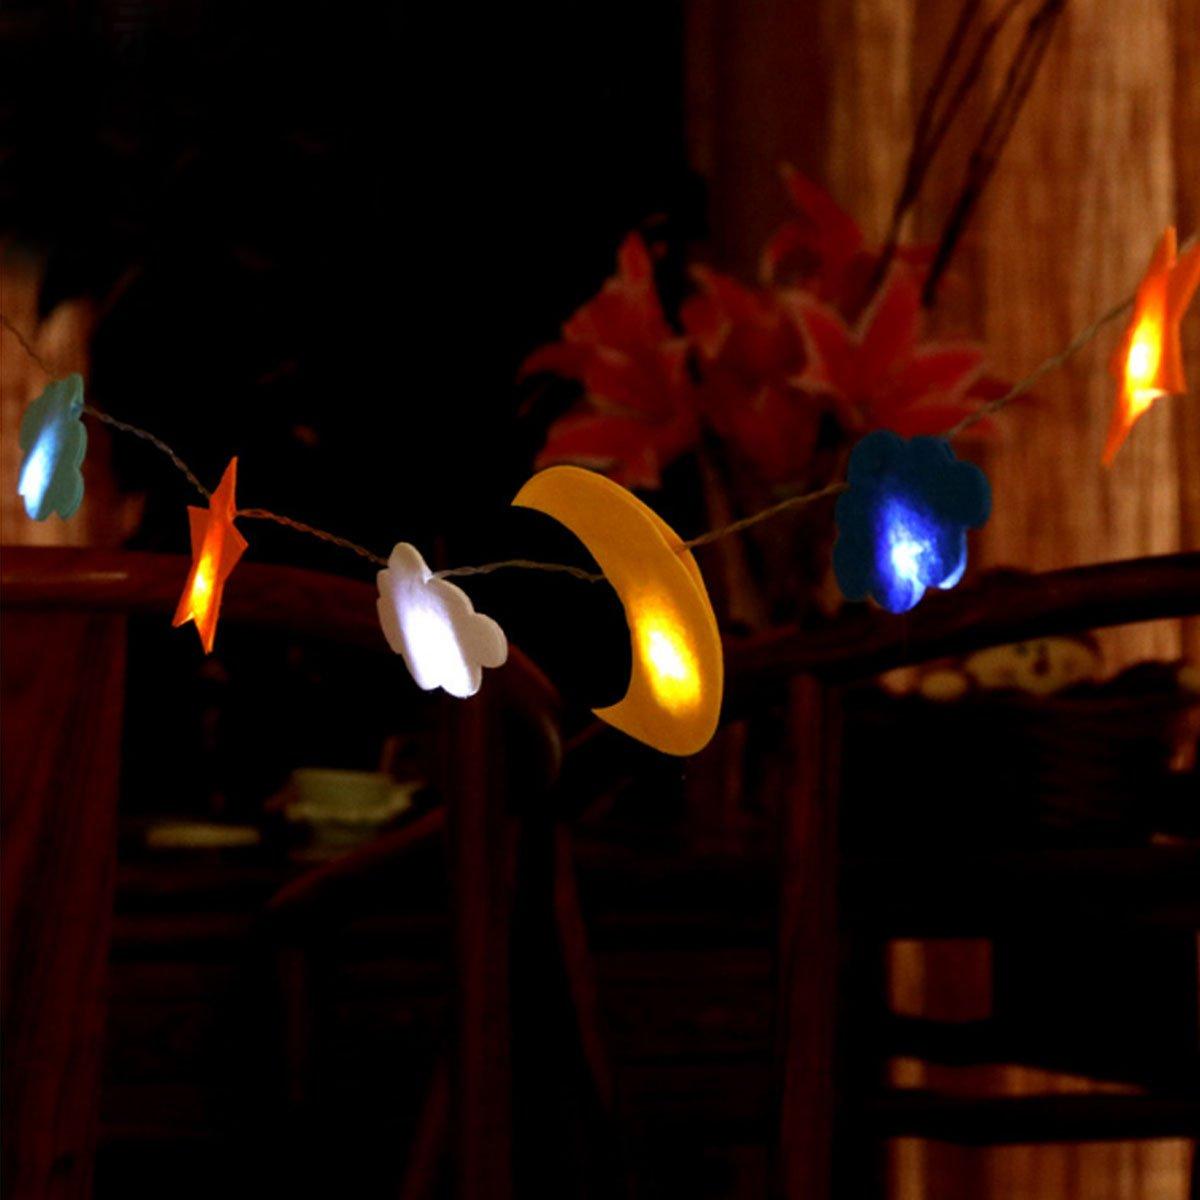 Meliya String Lights 40 LED White Snowflake Fairy Lights Battery Powered Indoor/Outdoor Decorative Lighting